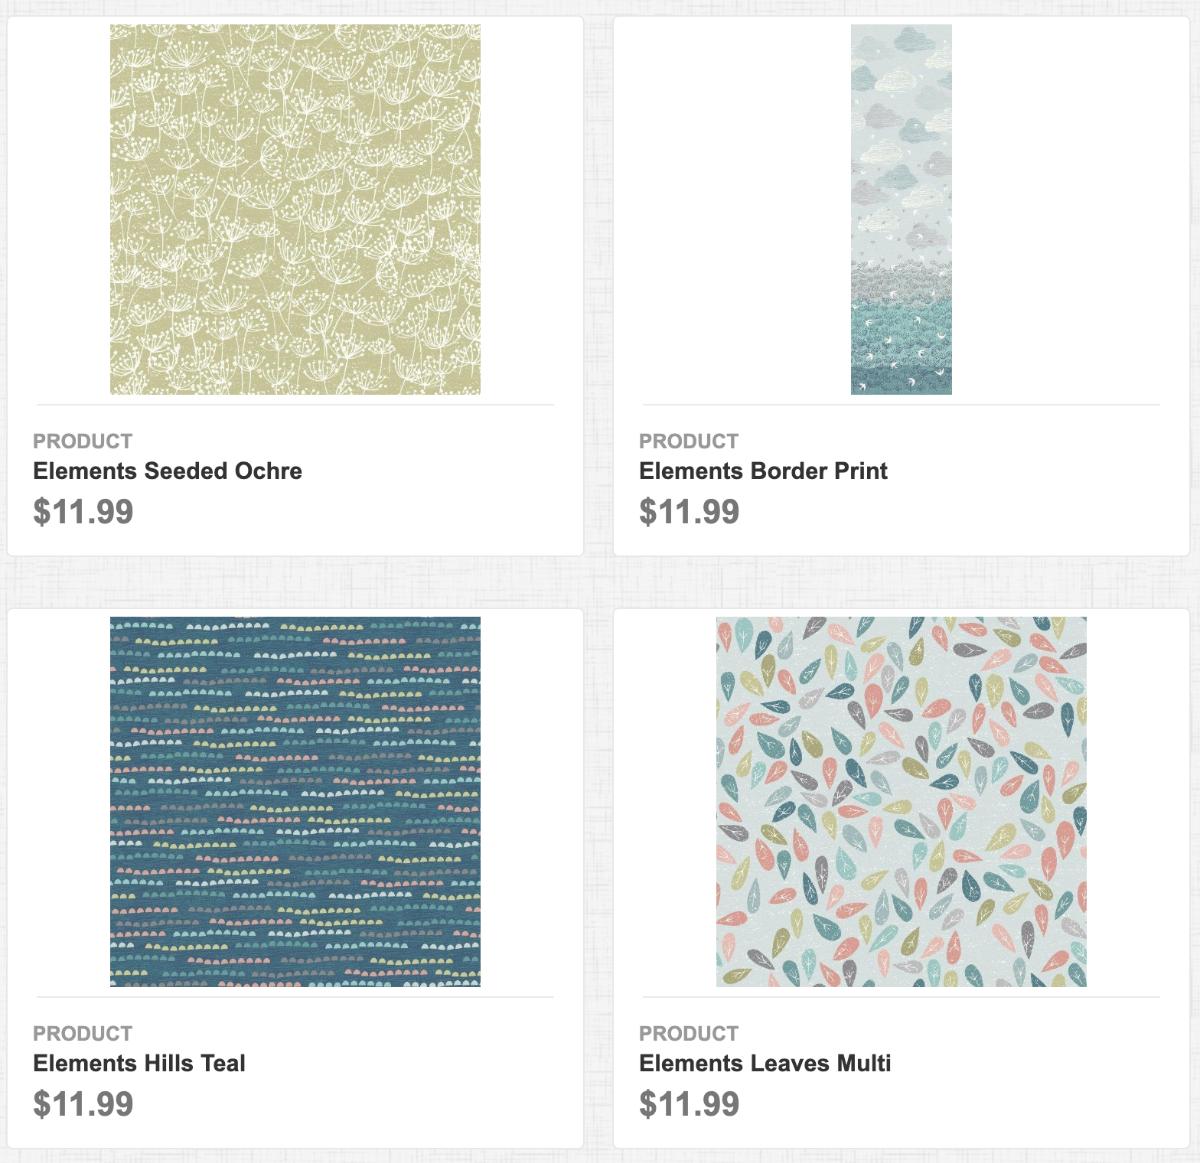 Elements: Seeded Ochre, Border Print, Hills Teal, Leaves Multi